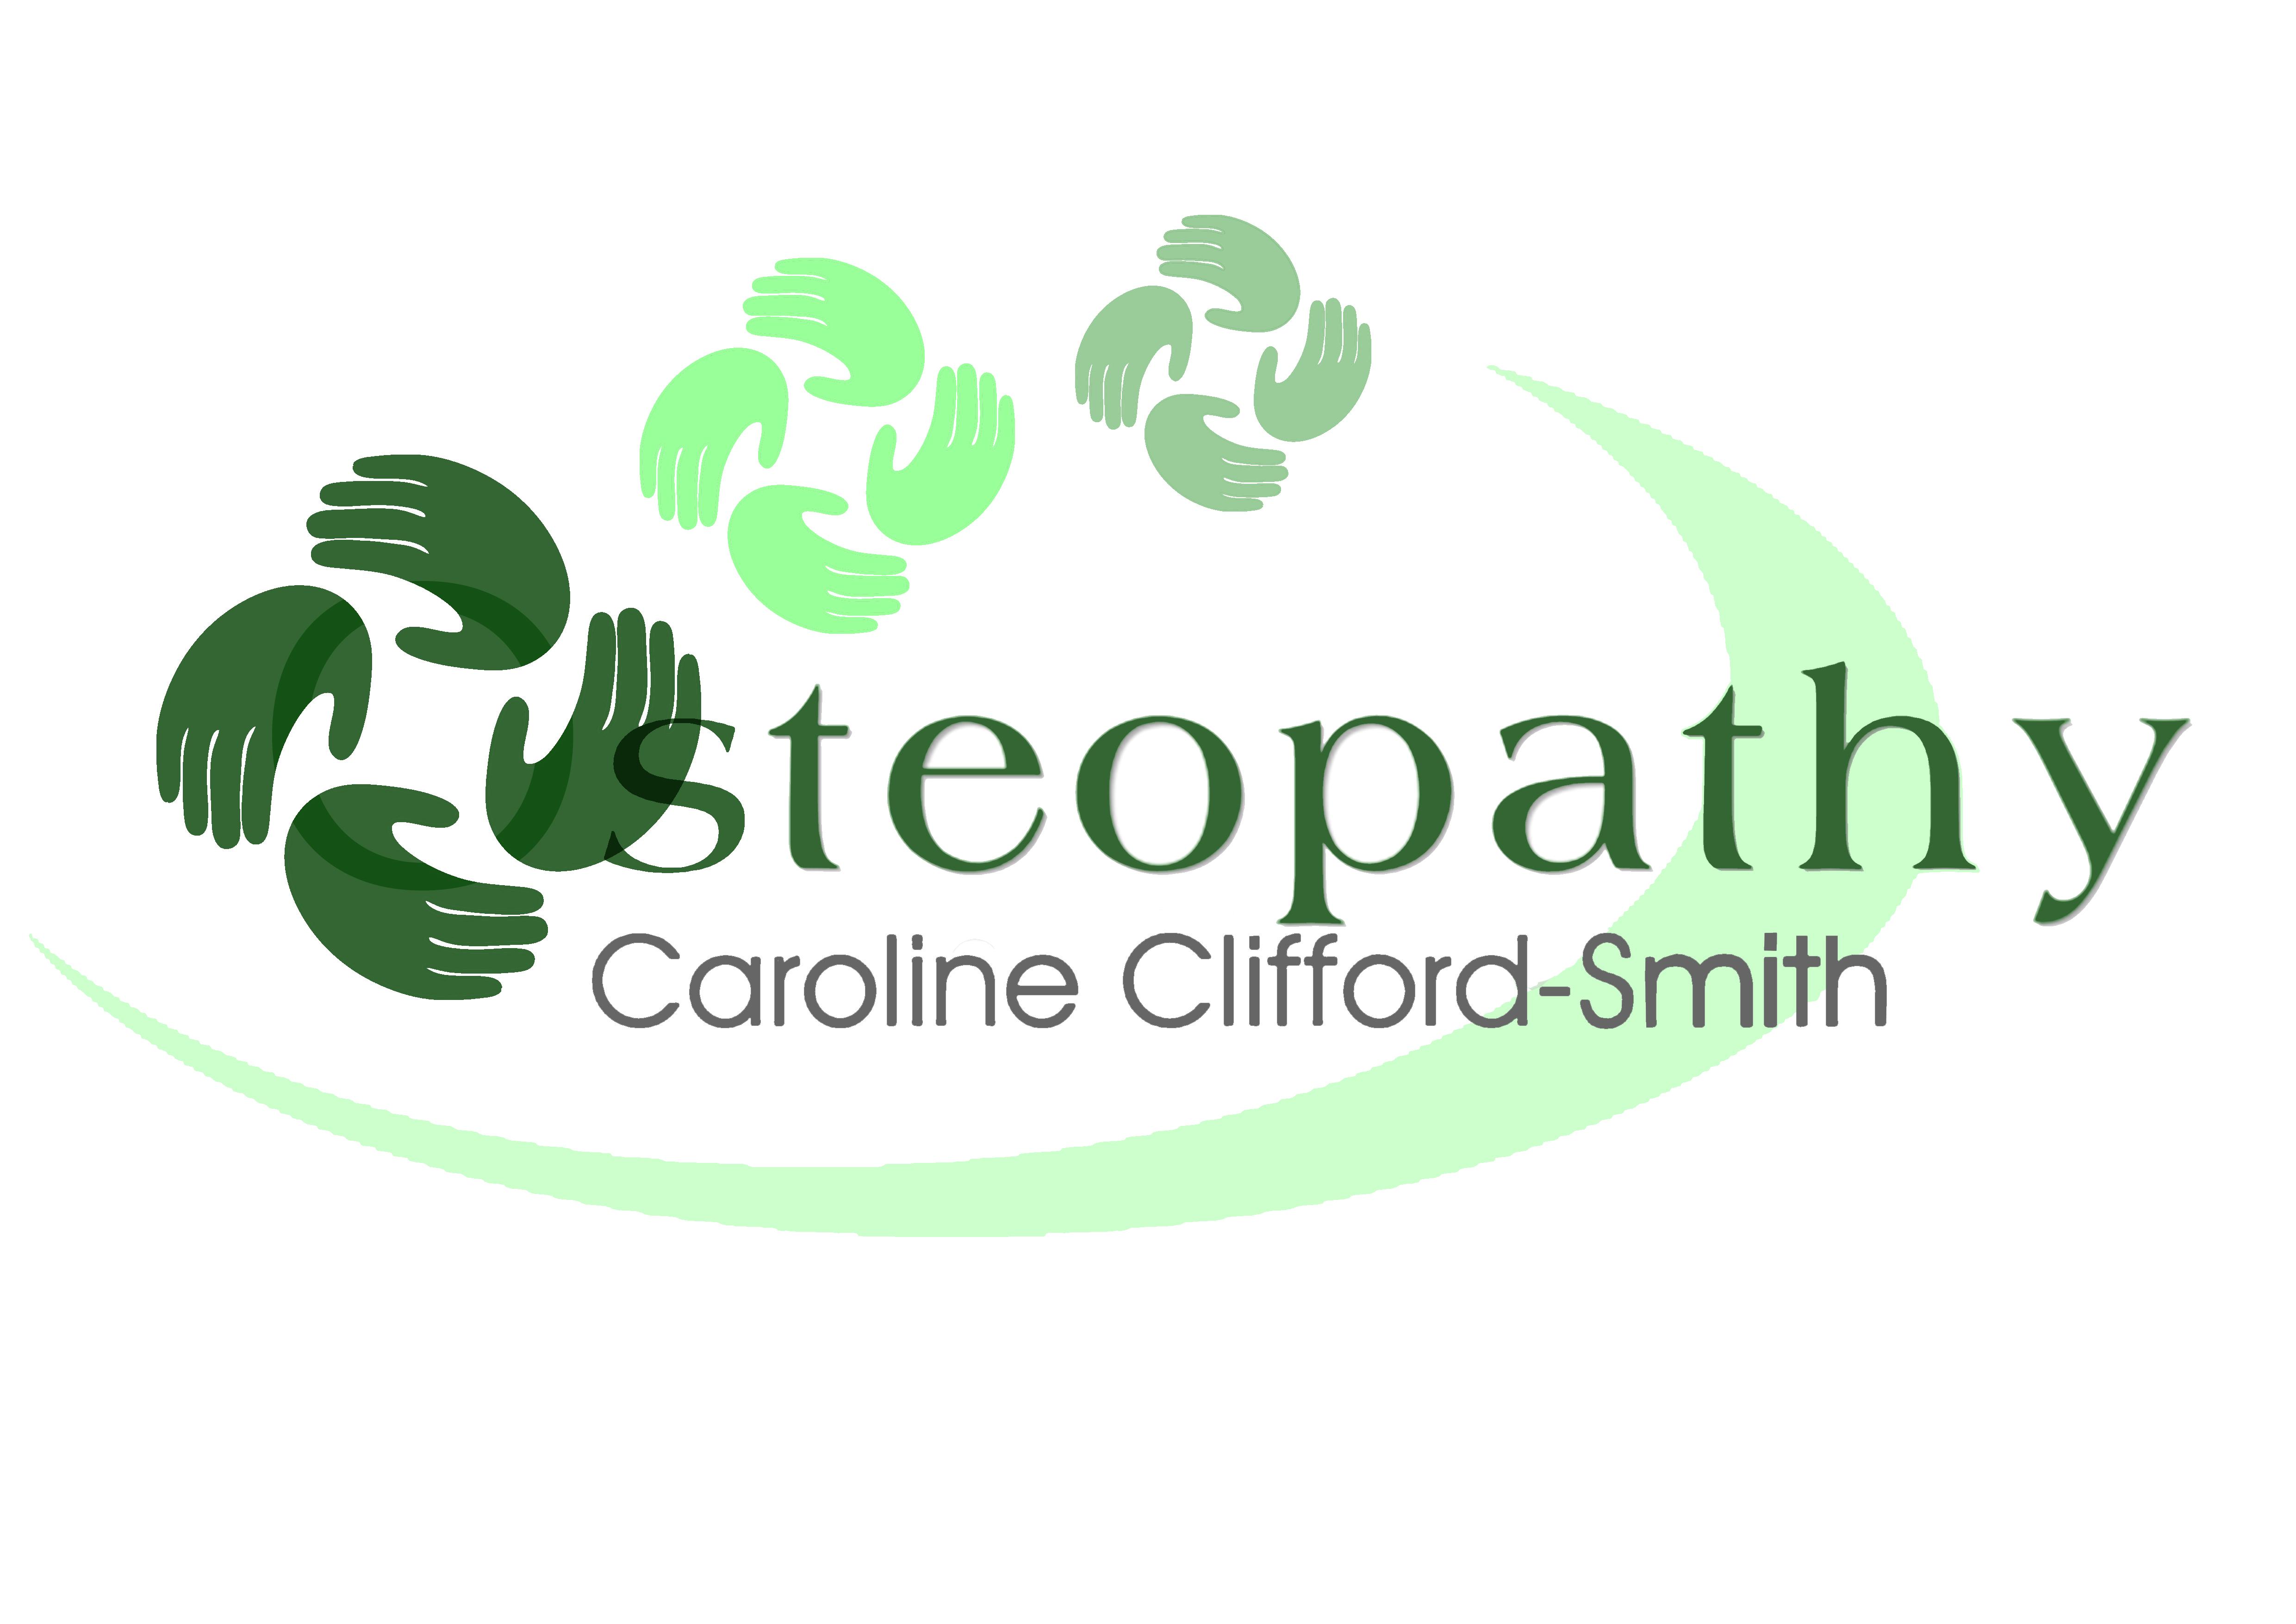 Caroline Clifford-Smith Osteopathy company logo